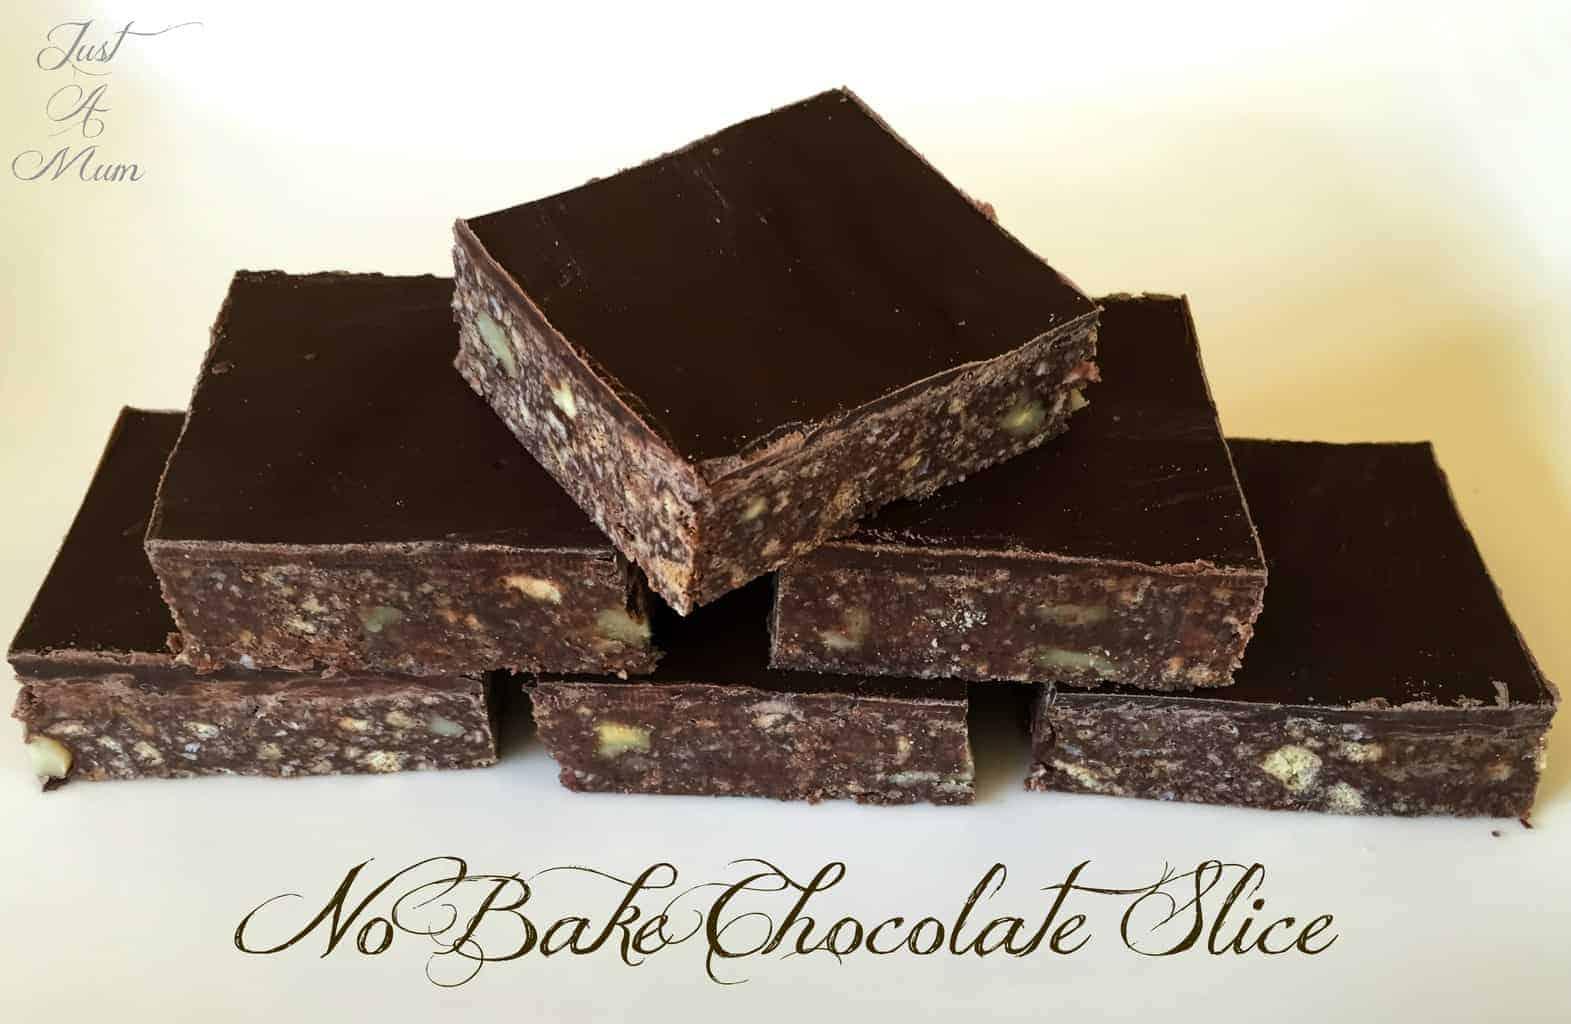 Just A Mum's No-Bake Chocolate Slice